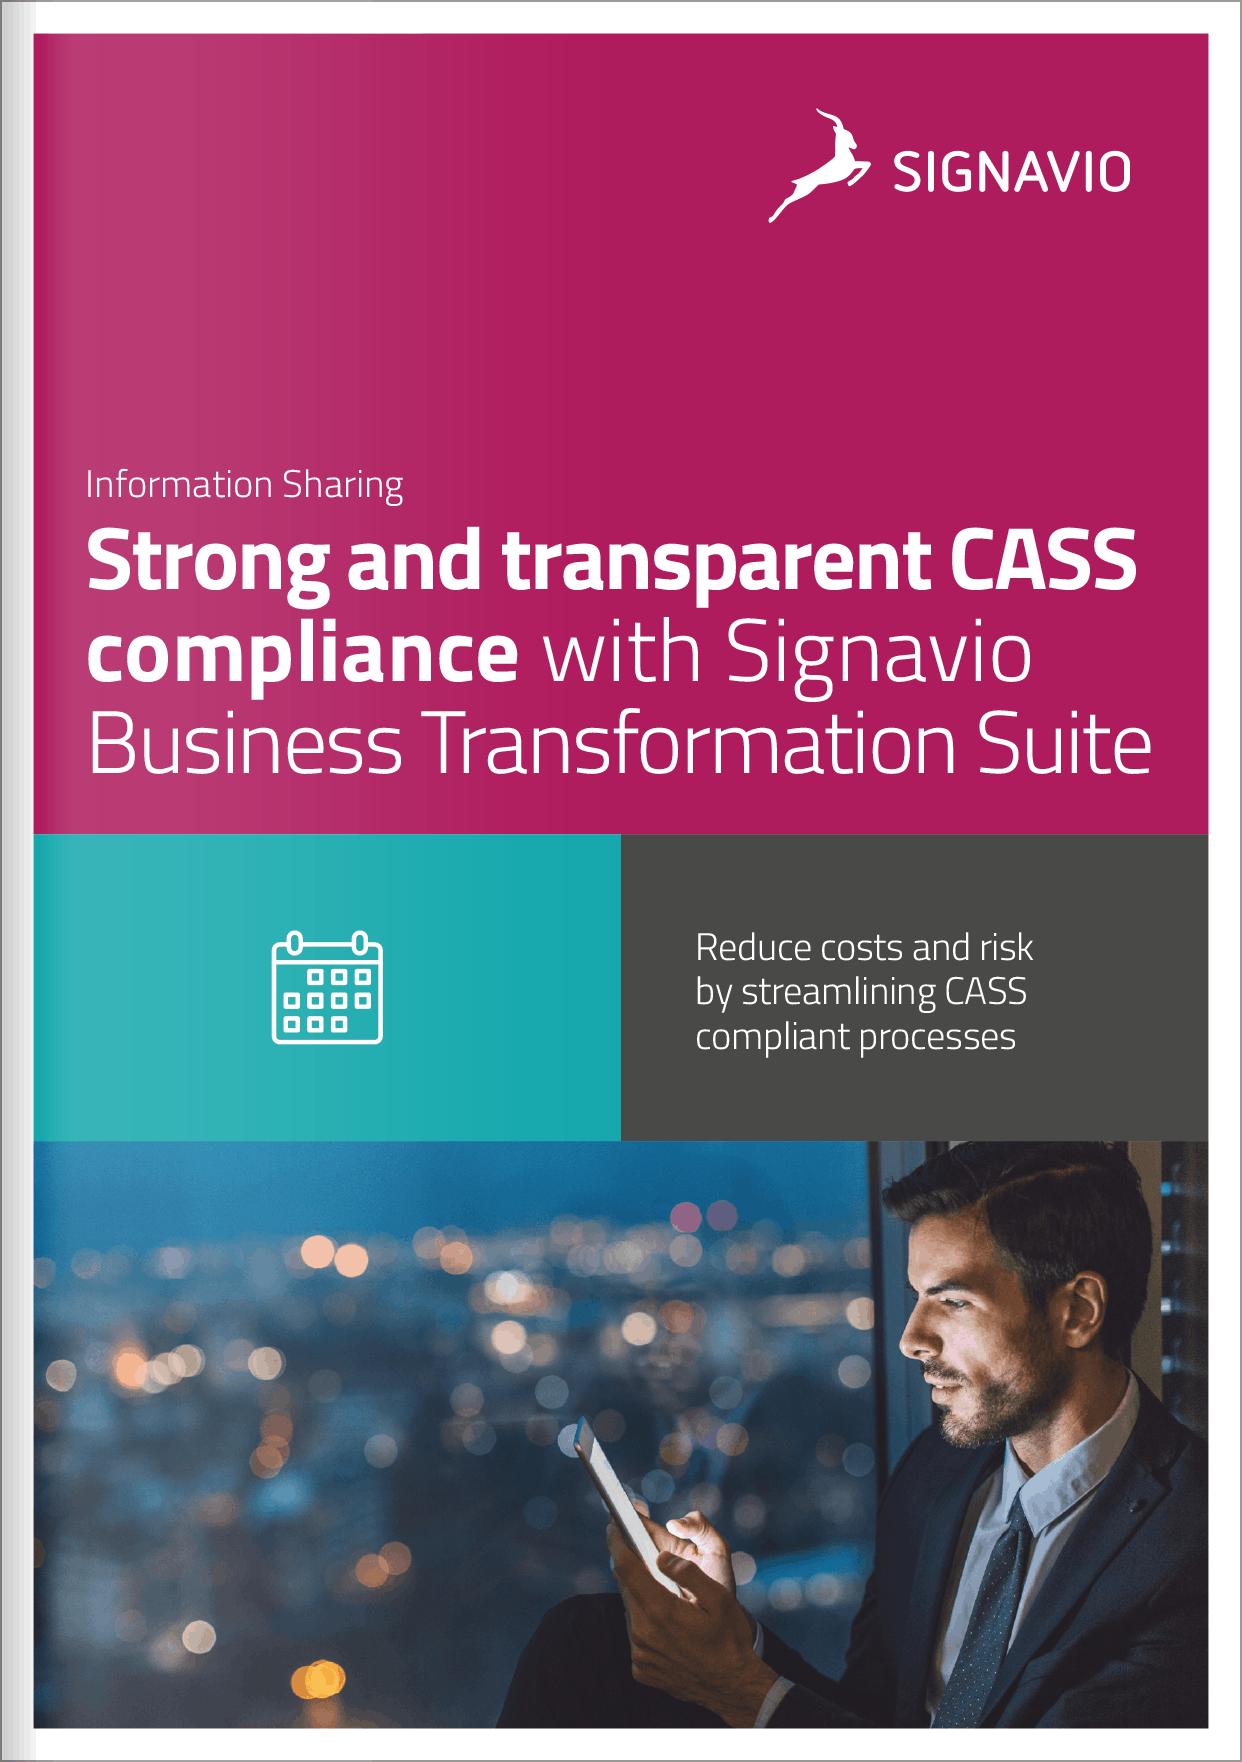 CASS compliance cover